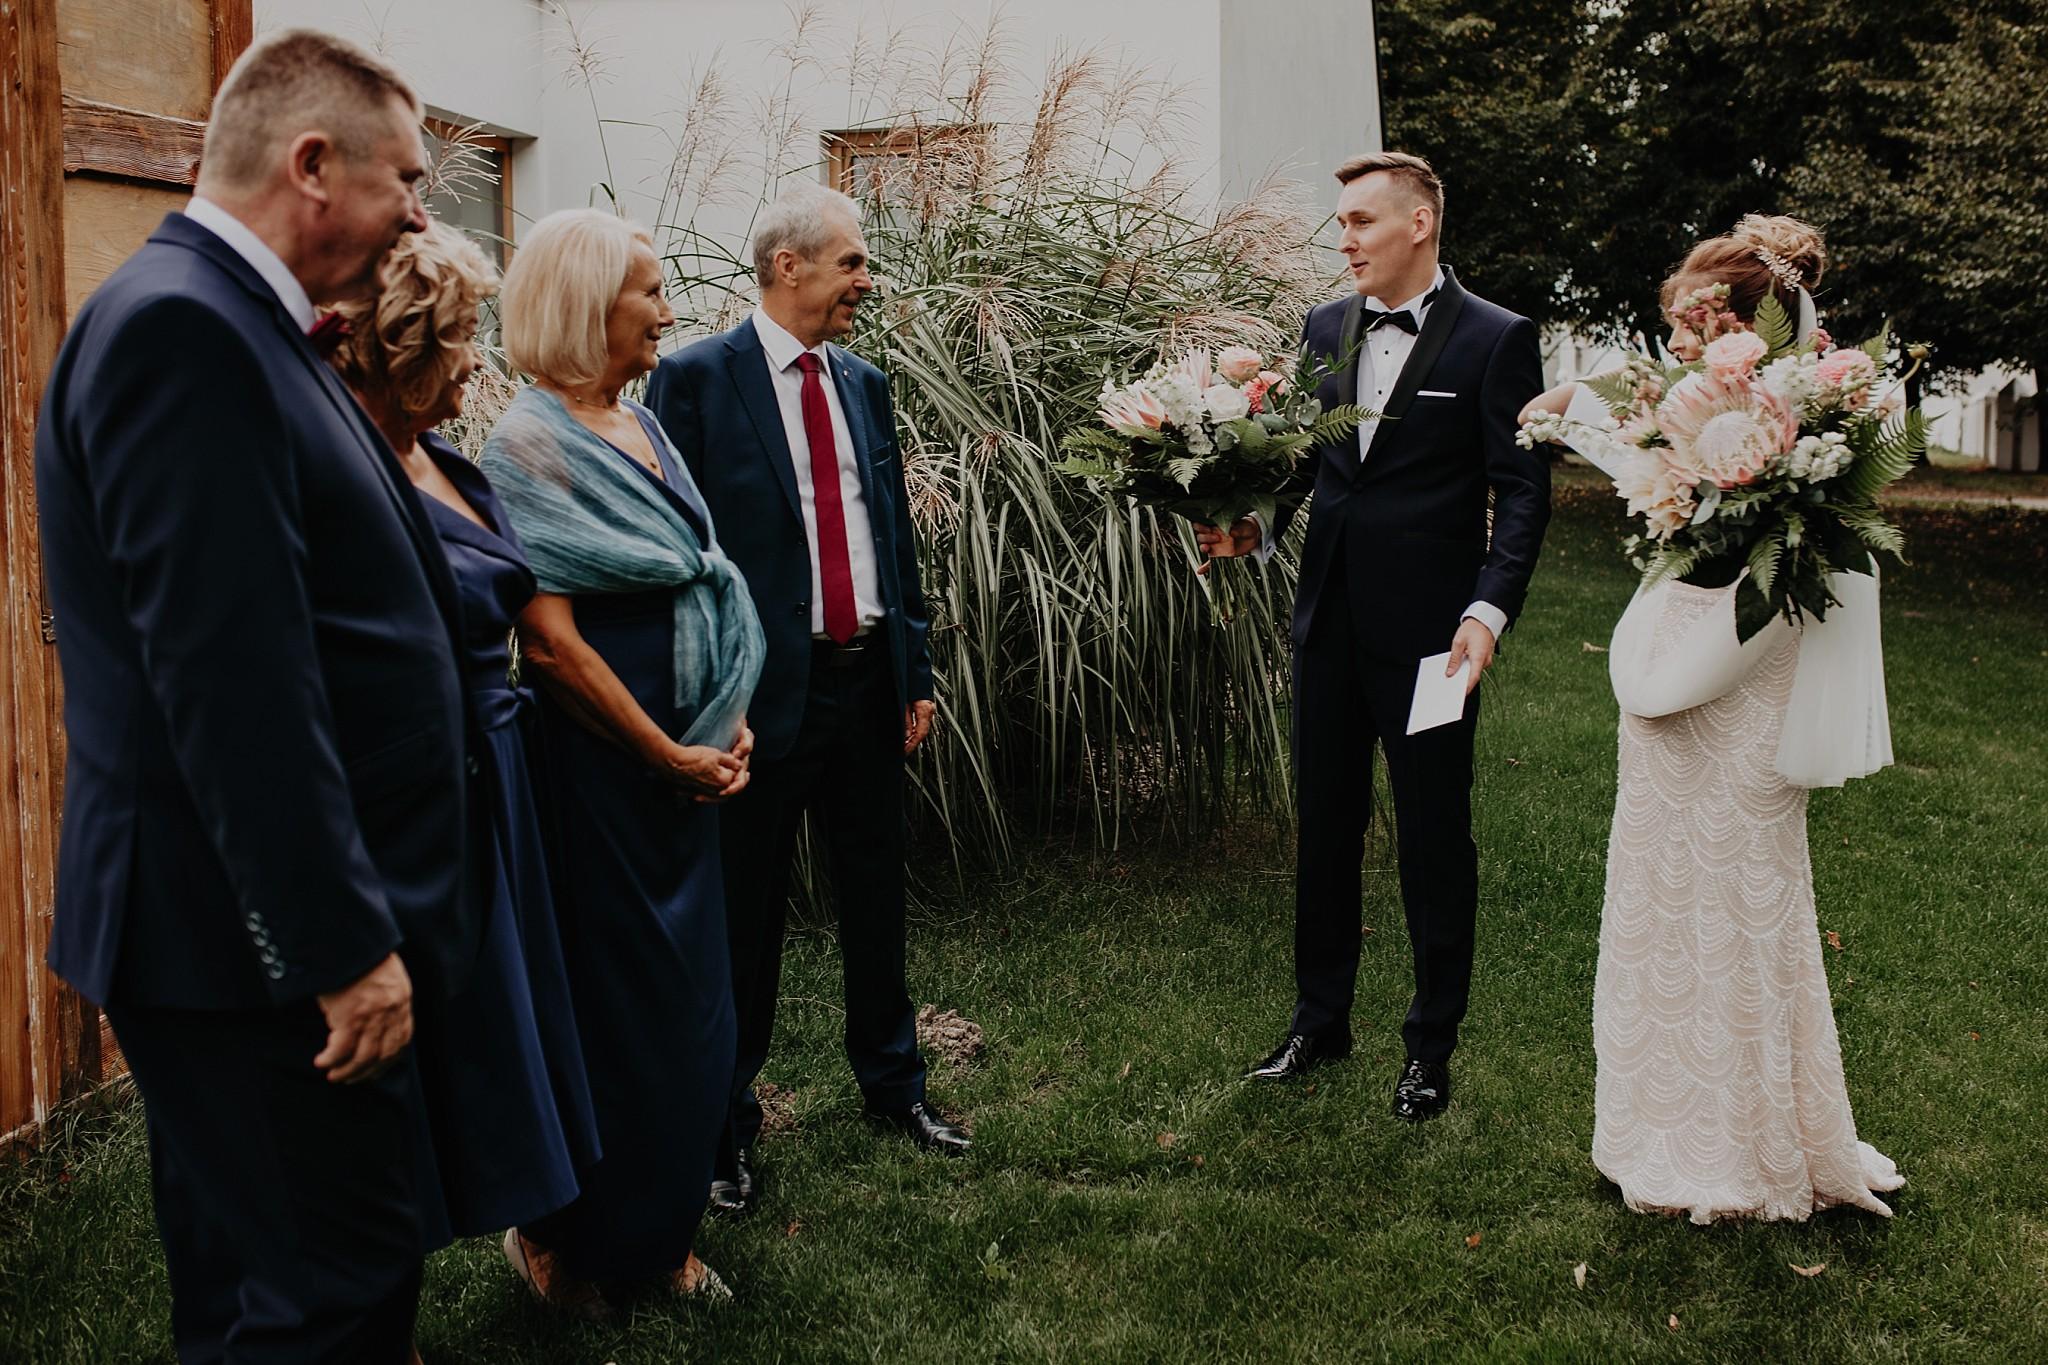 fotograf poznan wesele dobra truskawka piekne wesele pod poznaniem wesele w dobrej truskawce piekna para mloda slub marzen slub koronawirus slub listopad wesele koronawirus 093